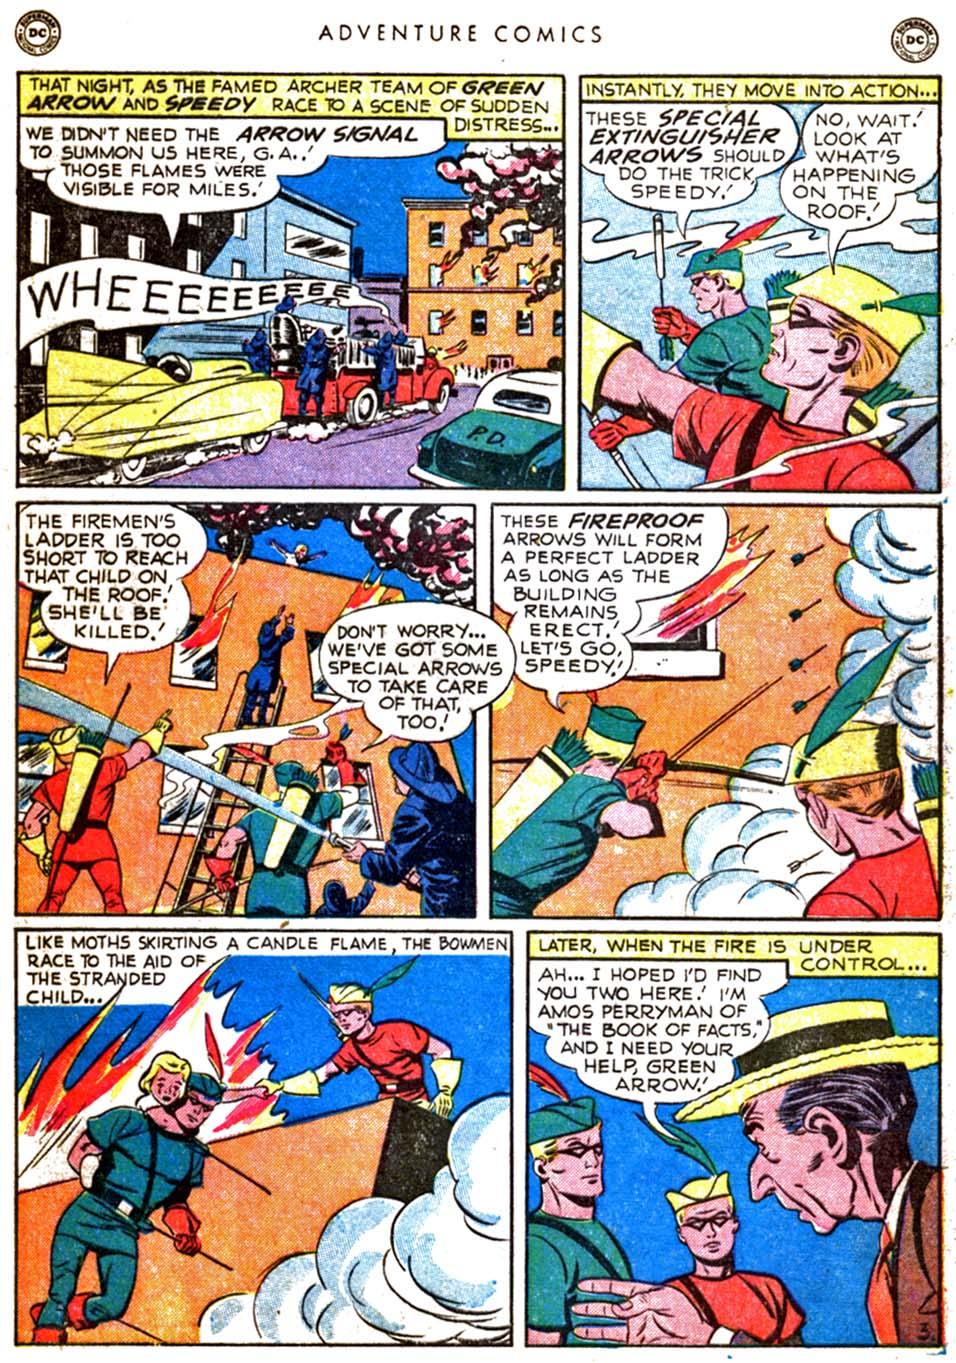 Read online Adventure Comics (1938) comic -  Issue #160 - 41